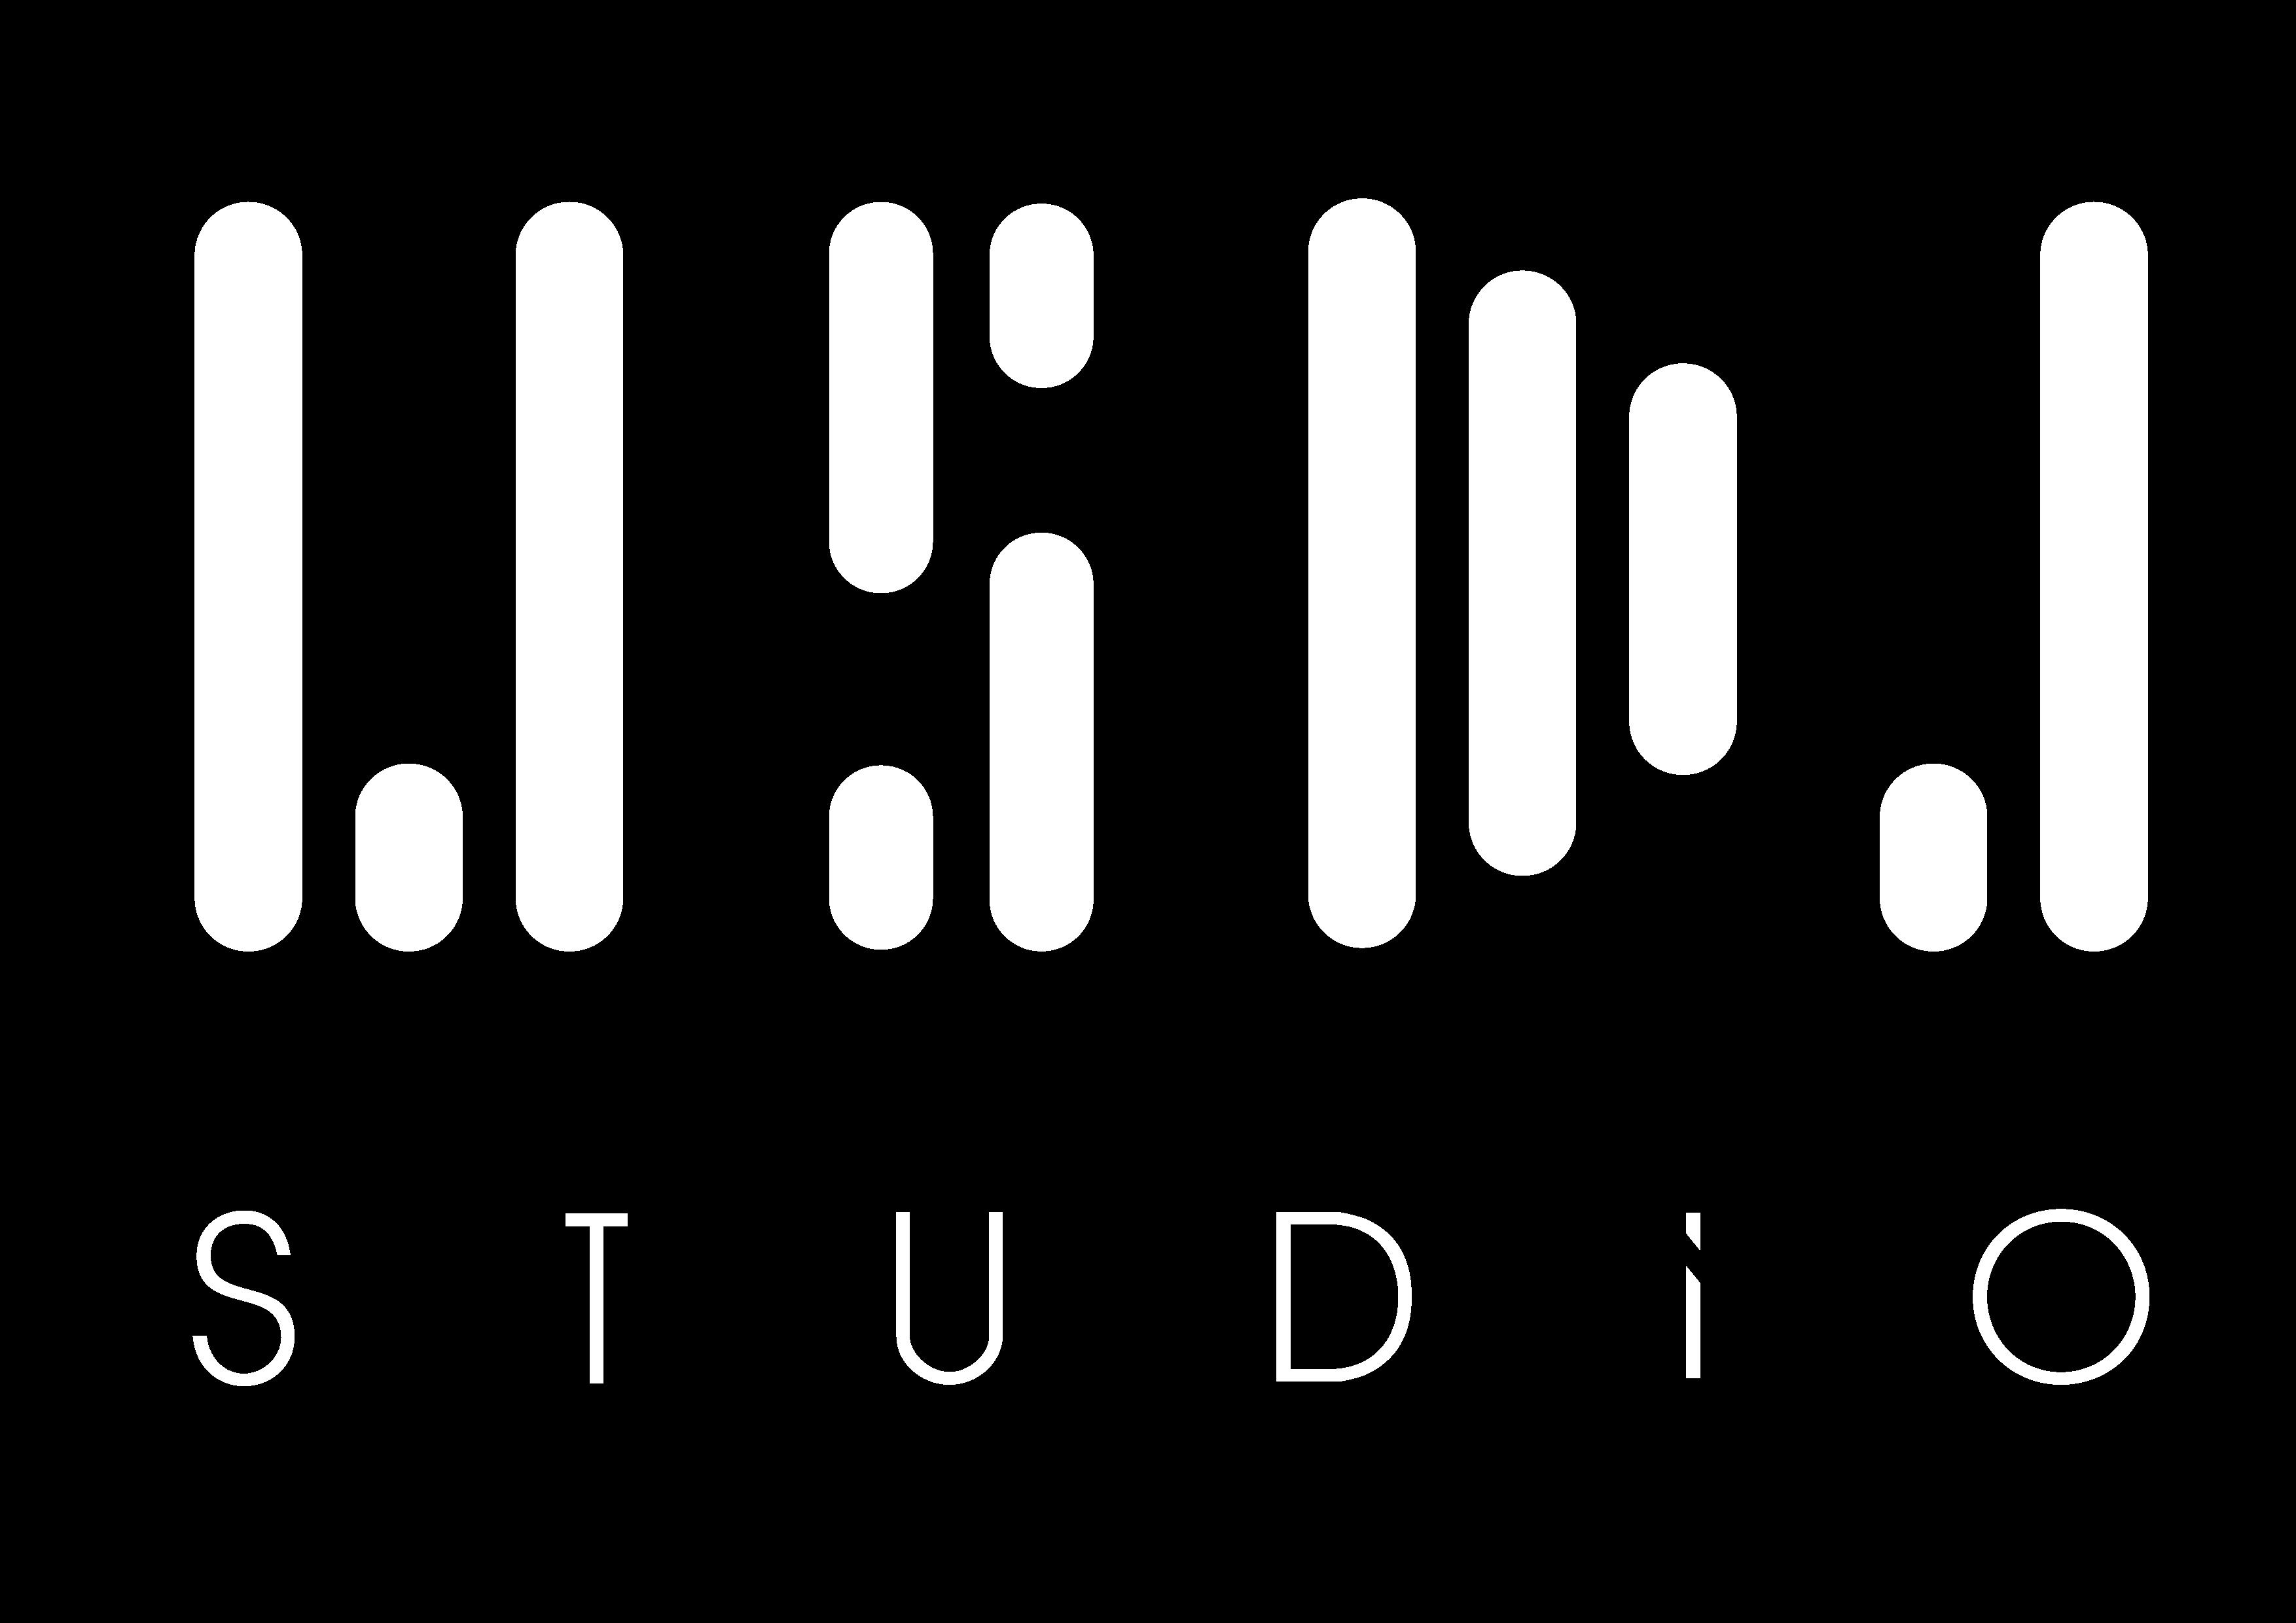 WSDJ Studio - WARSZTATY DJ | STUDIO DJ | SKLEP DJ